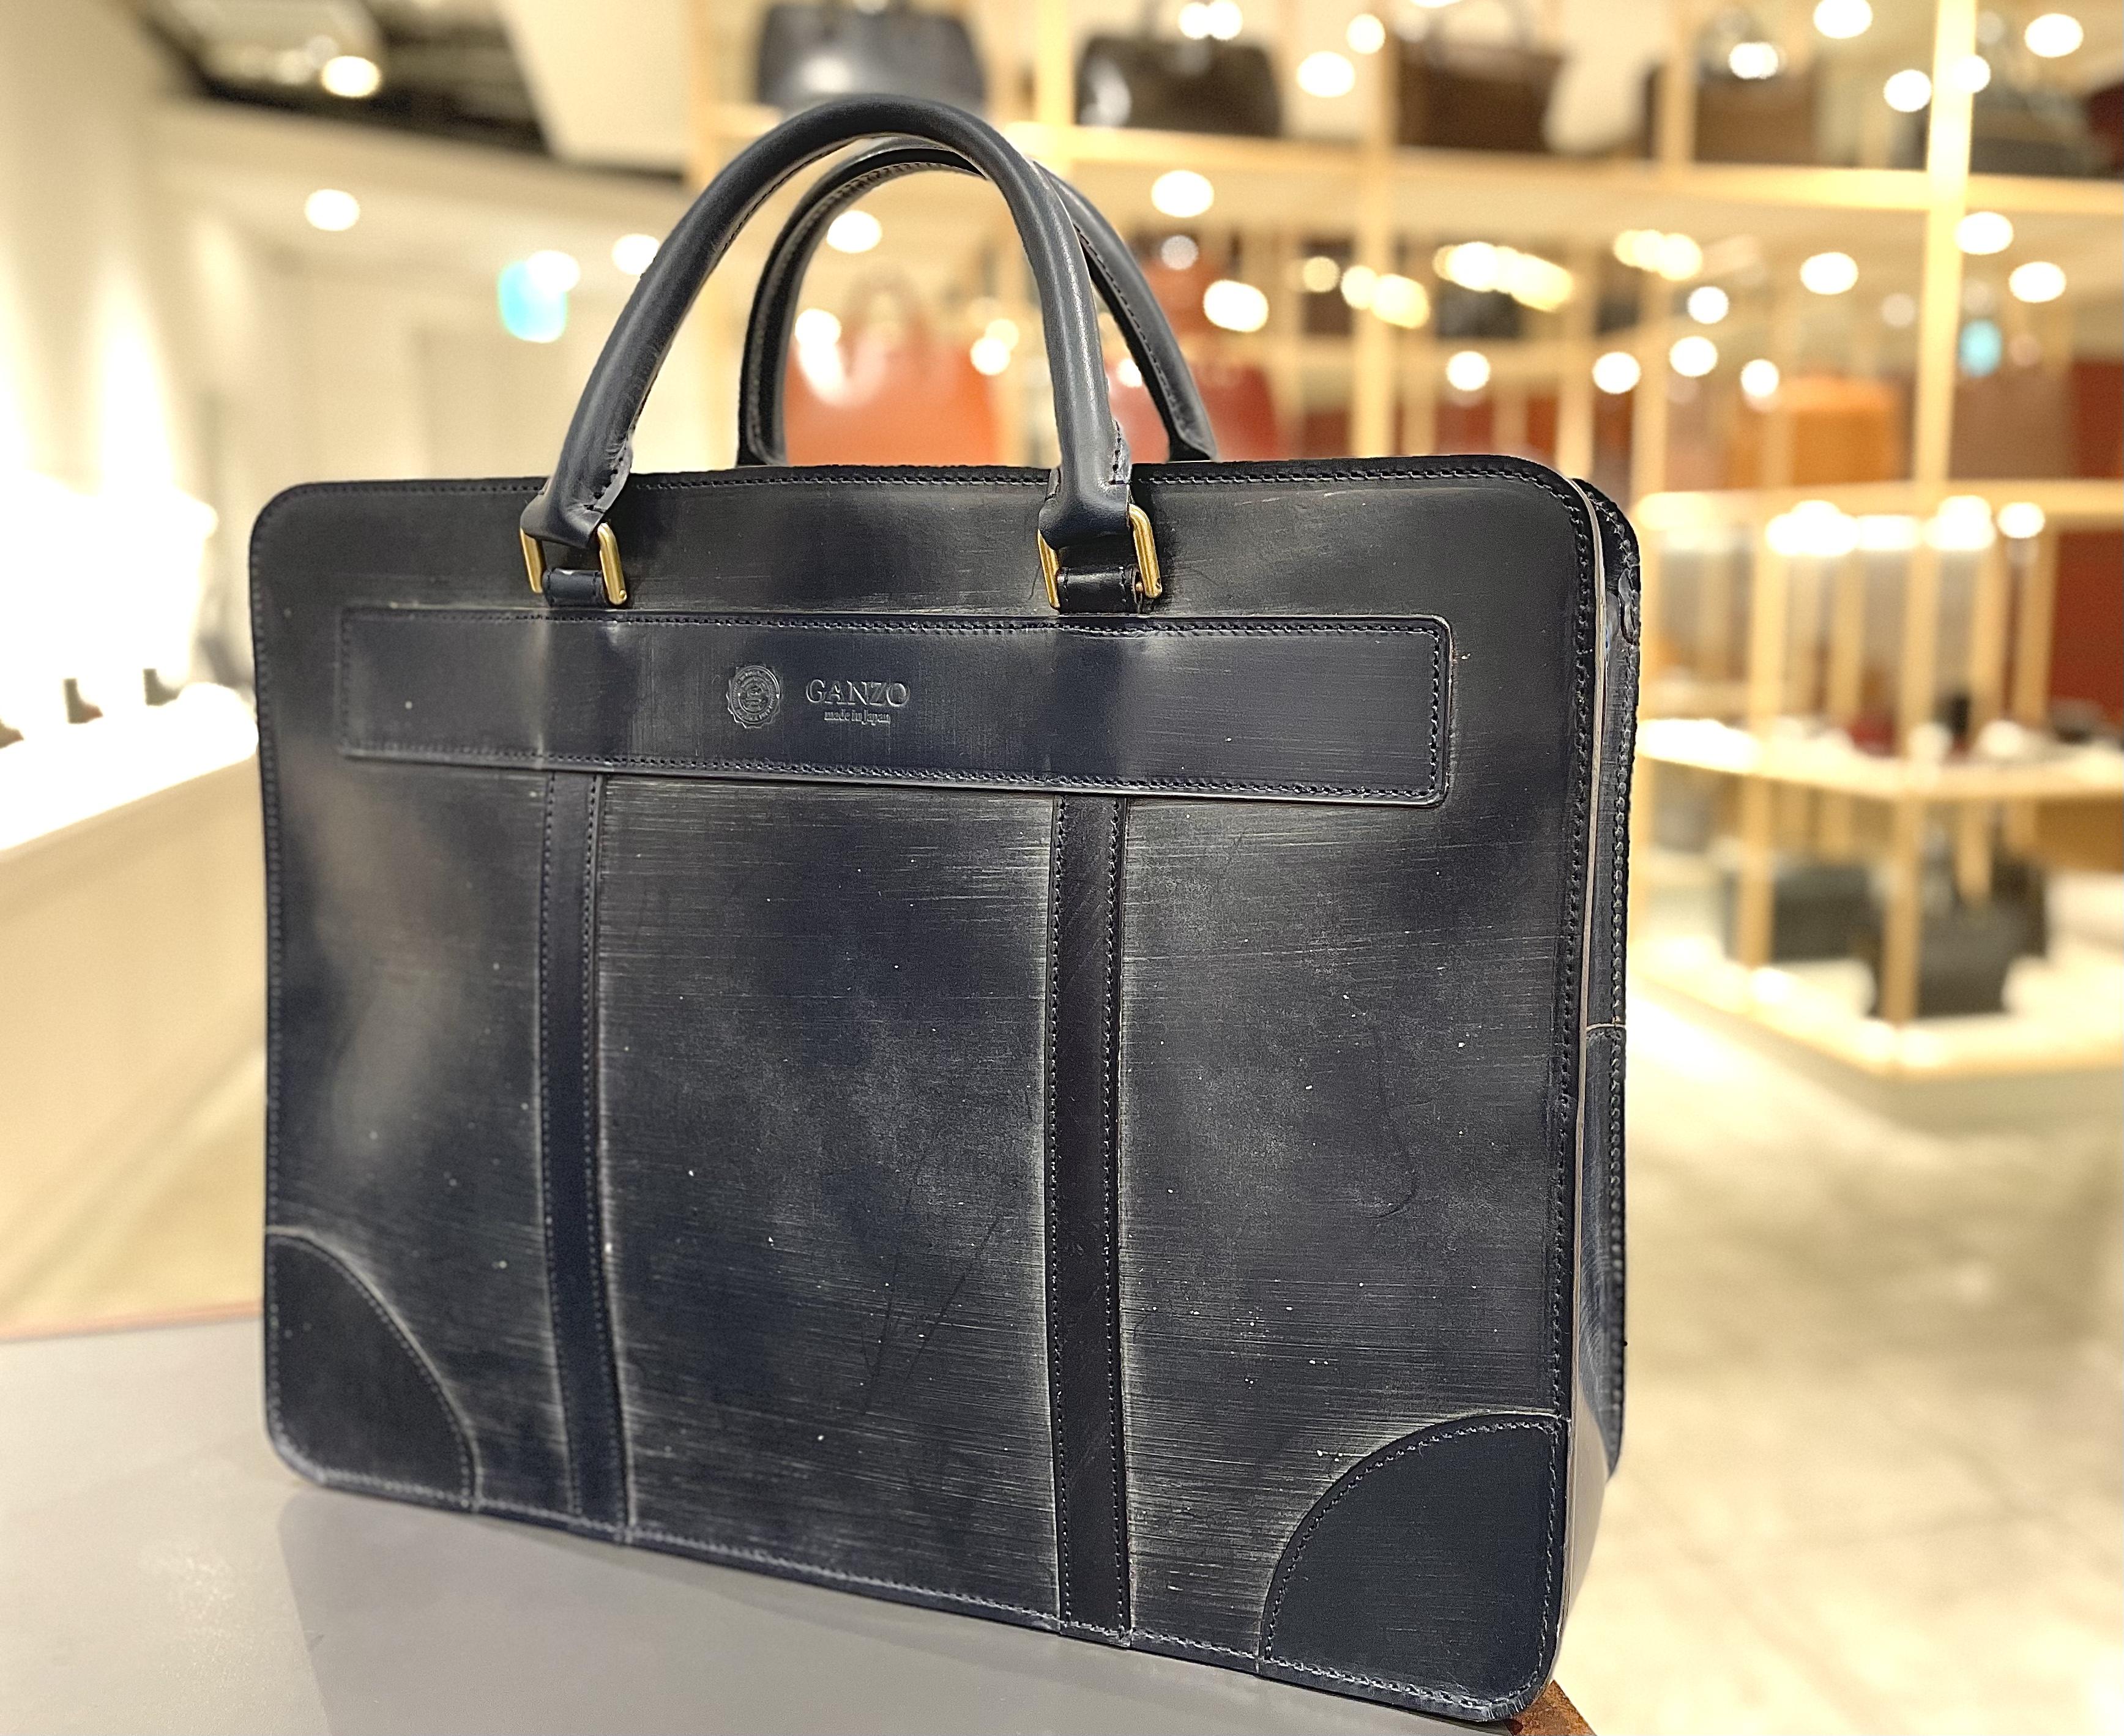 GANZO六本木店スタッフお勧めのビジネスバッグ